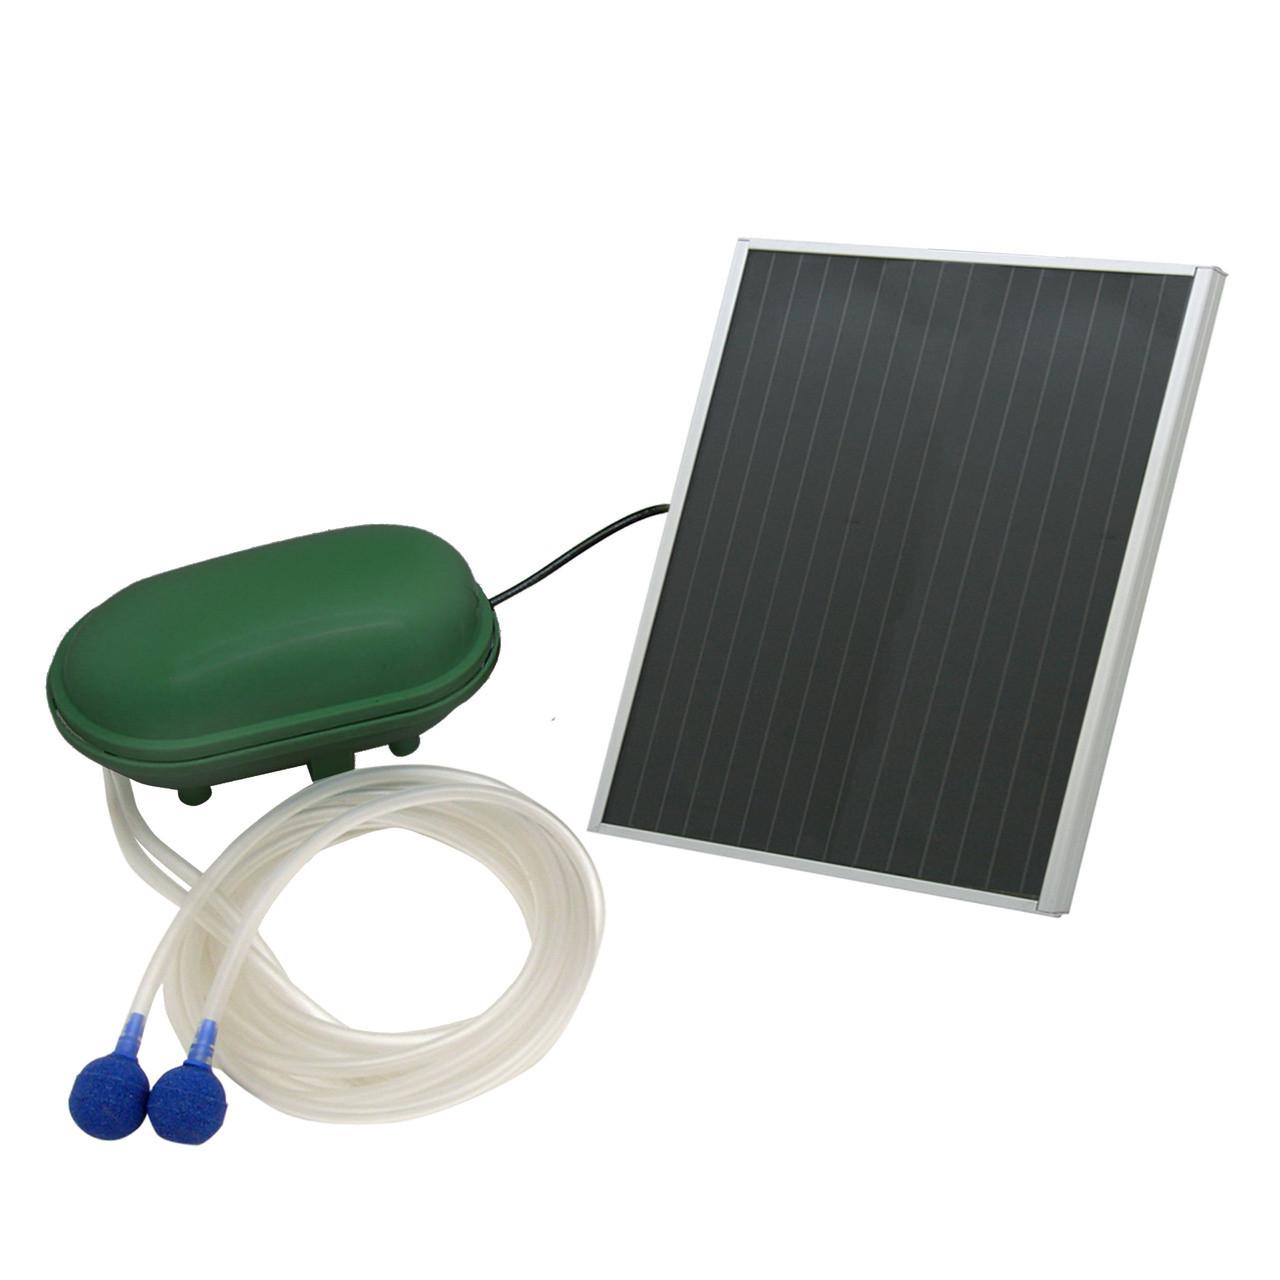 New solar outdoor pond fountain oxygenator plus air pump for Pond oxygenator